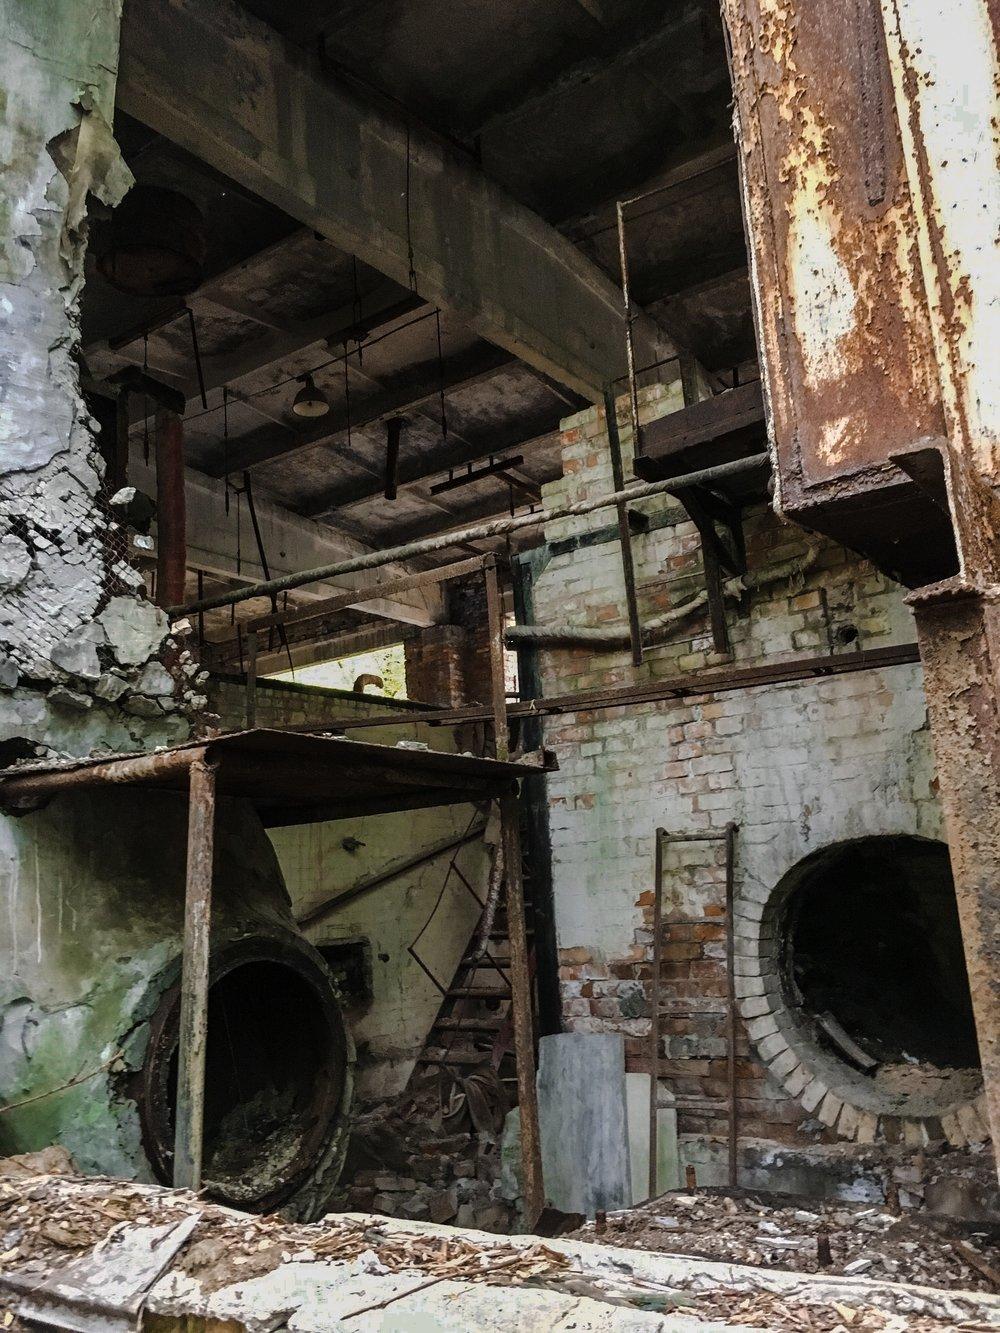 Is Chernobyl Safe?